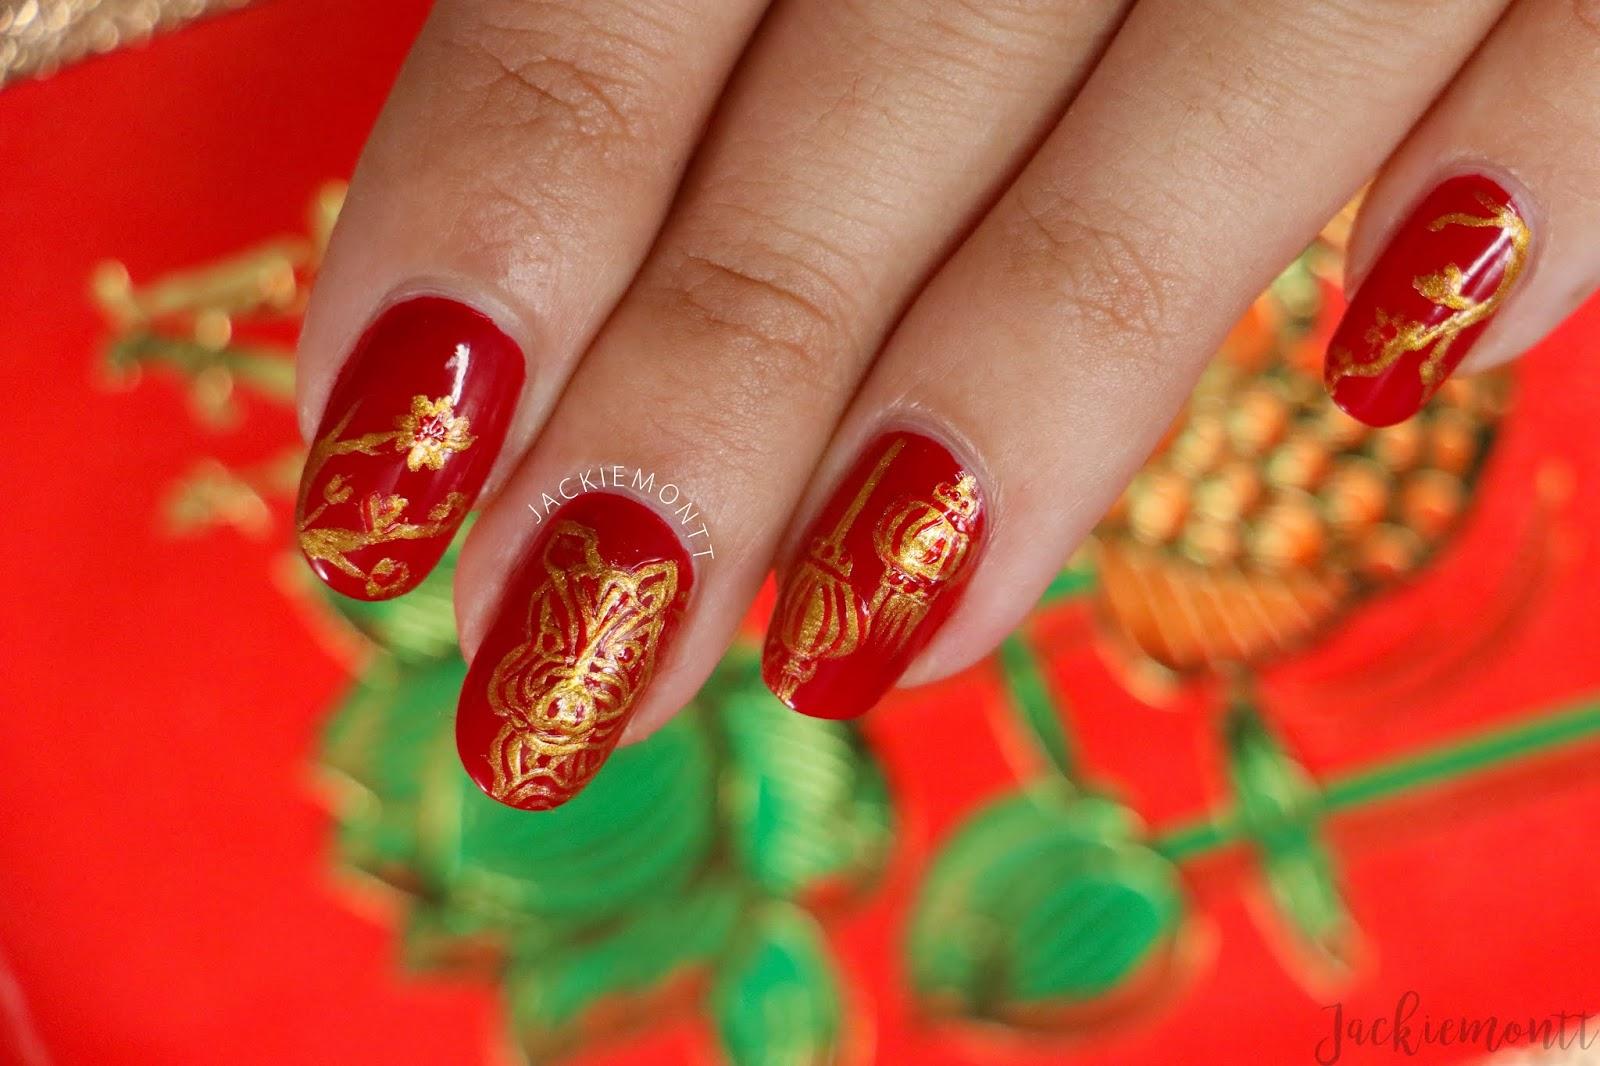 Chinese New Year Nail Art - JACKIEMONTT